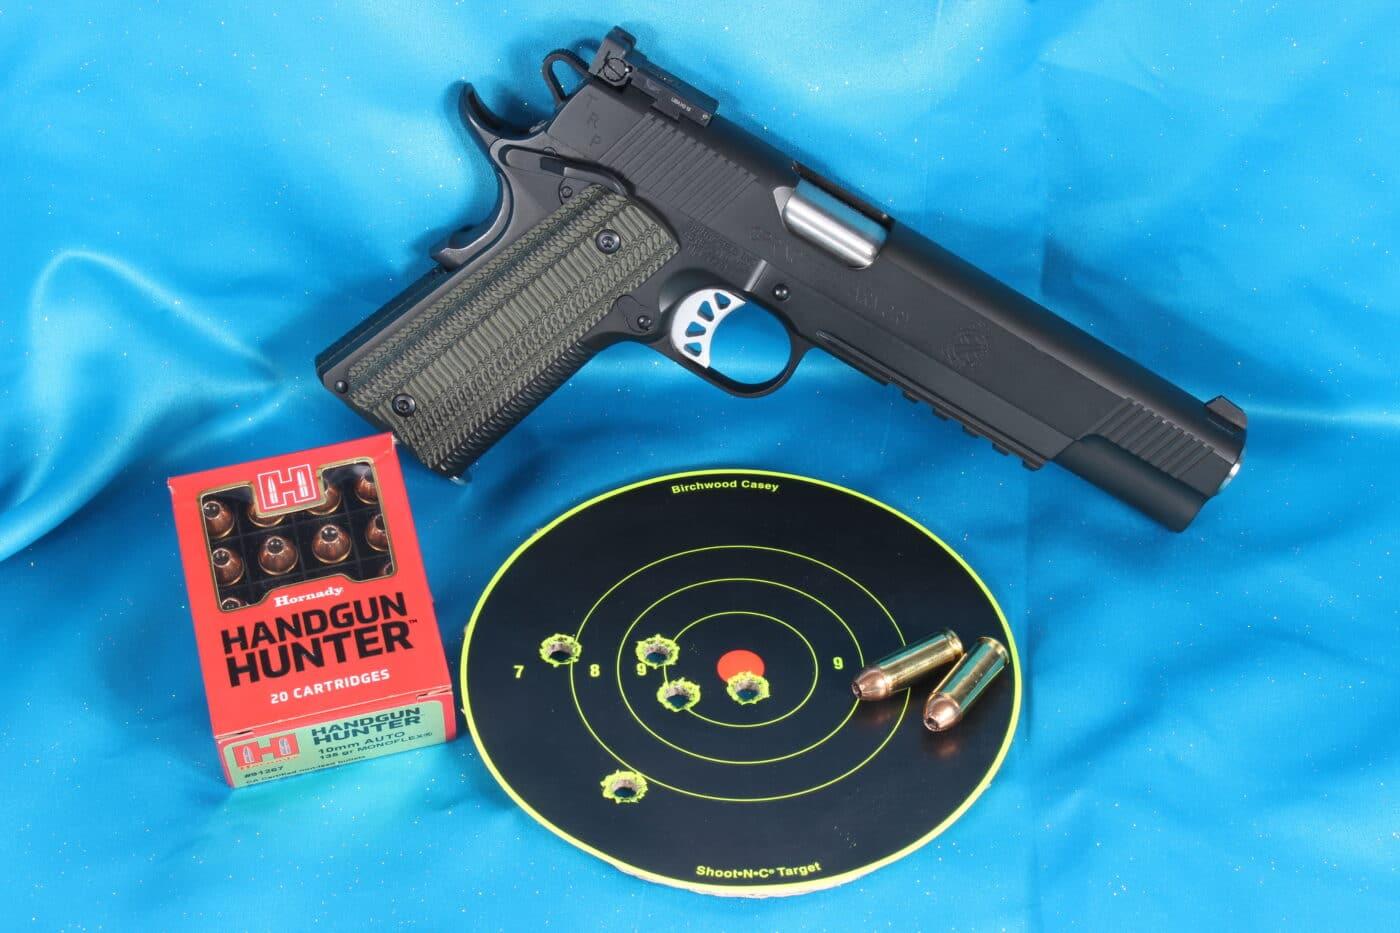 Hornady Handgun Hunter ammo with 911 pistol and test target